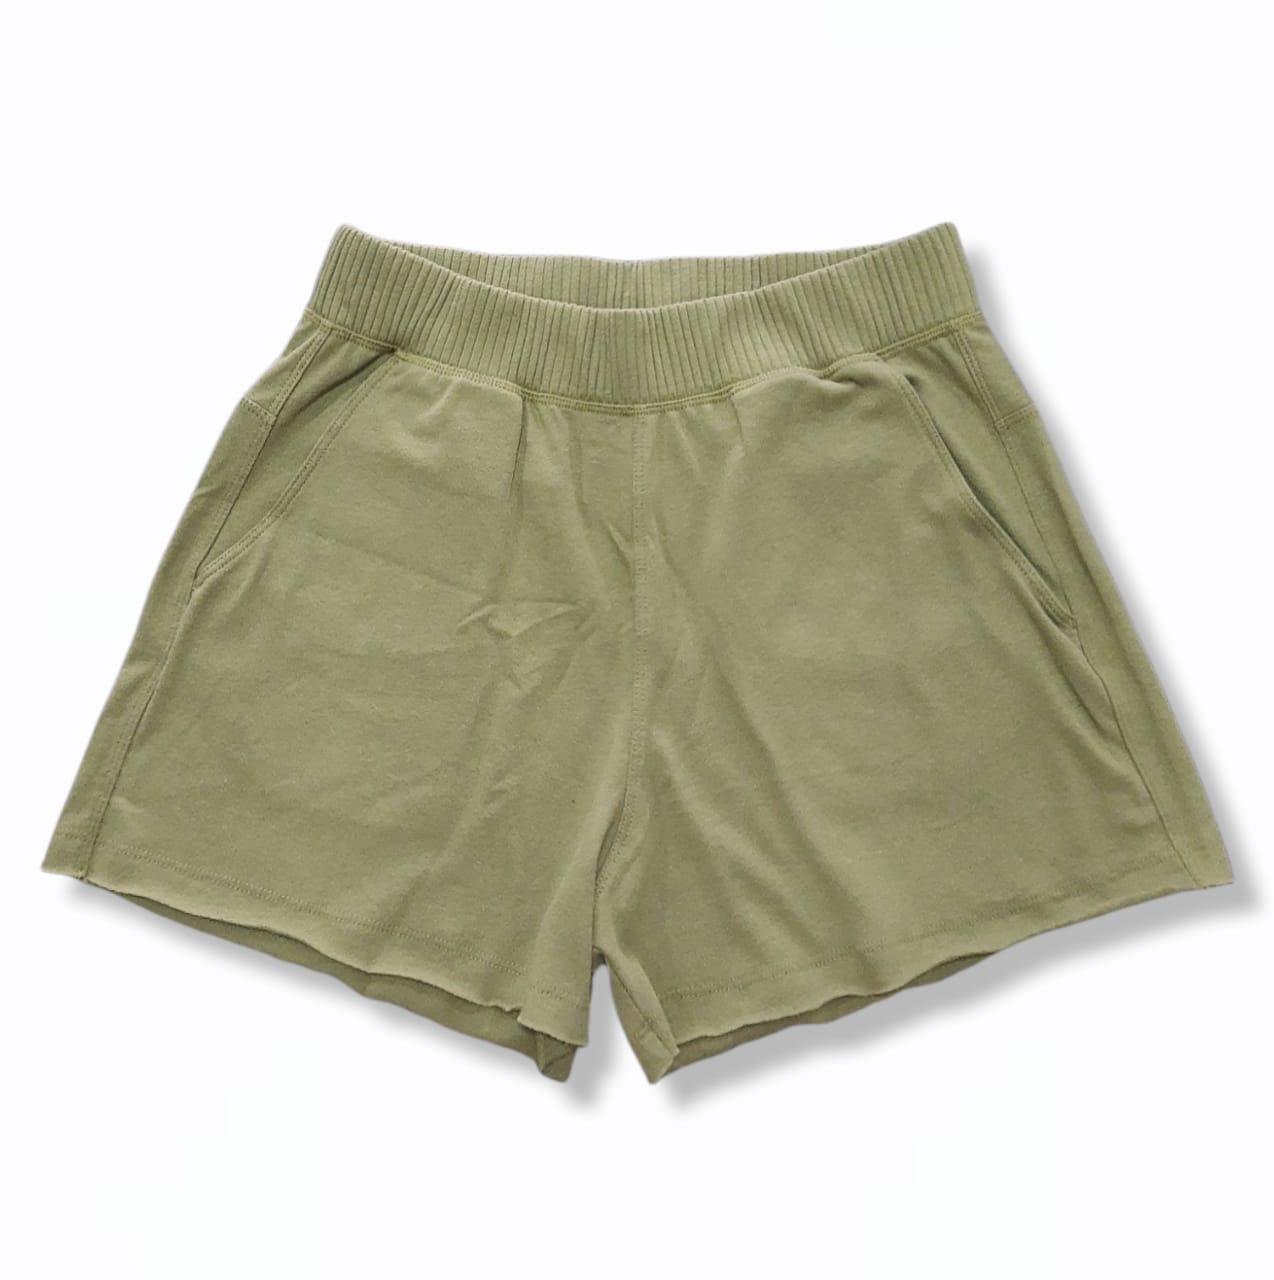 Shorts Lupo Moletom - Feminino